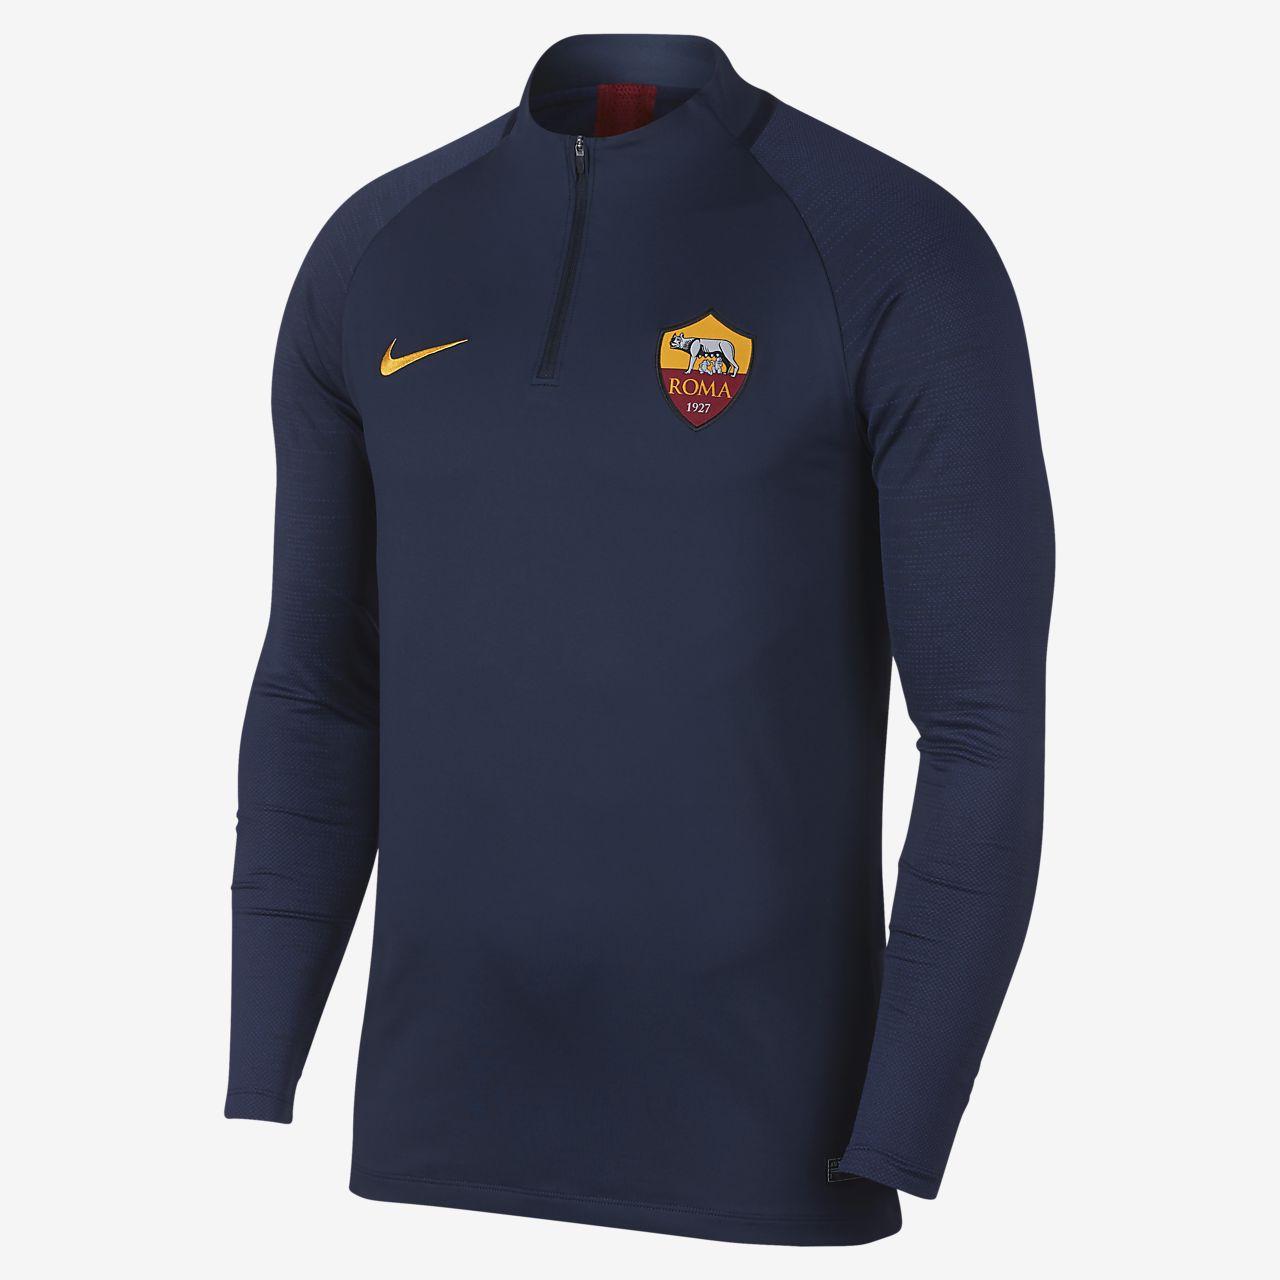 Nike Dri-FIT A.S. Roma Strike Camiseta de fútbol de entrenamiento - Hombre